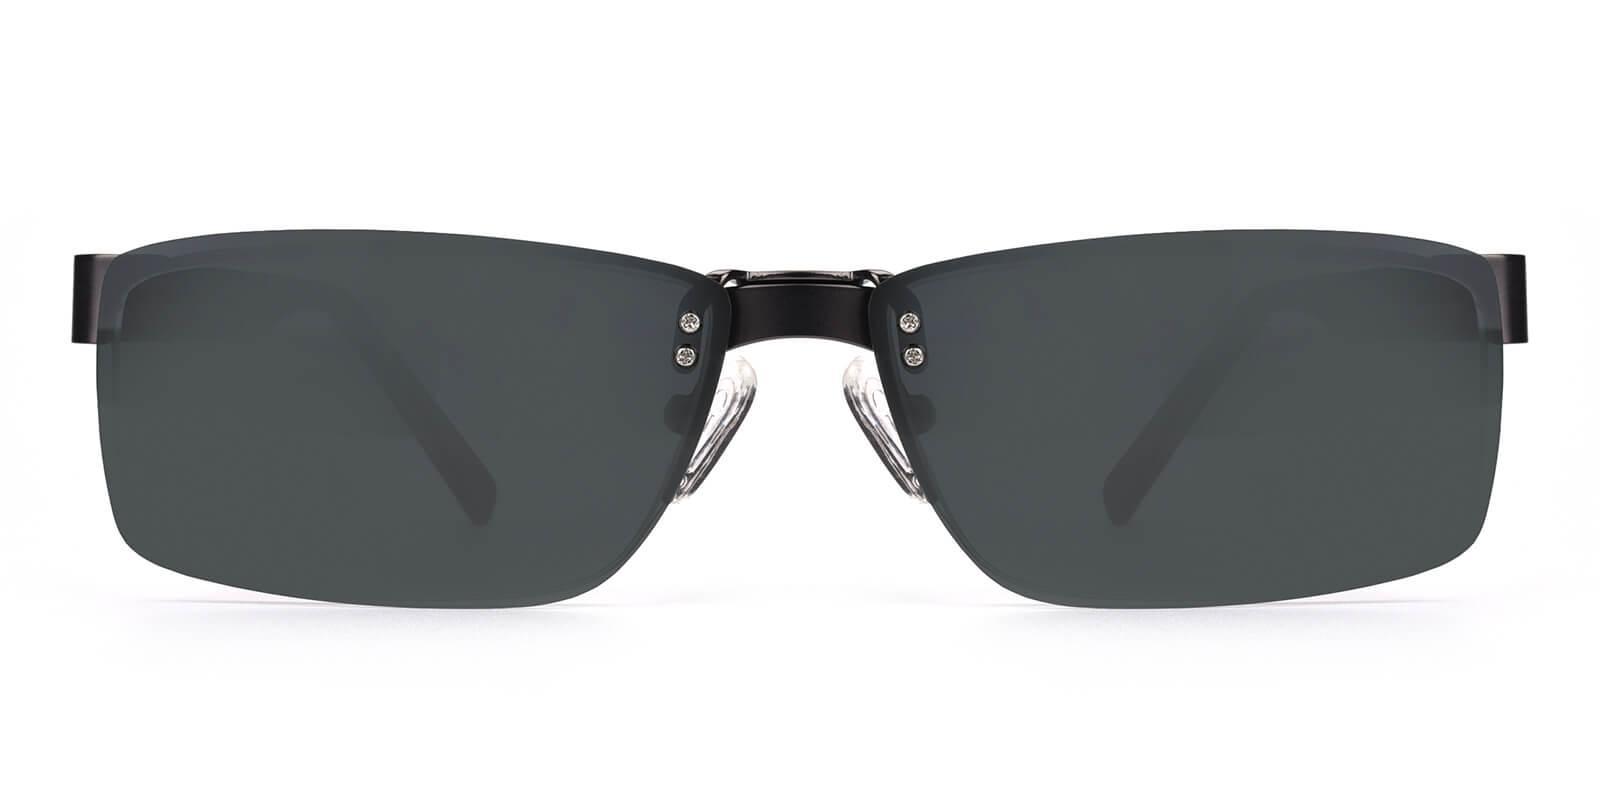 Sparkle-Gun-Rectangle-Metal-Eyeglasses-additional2